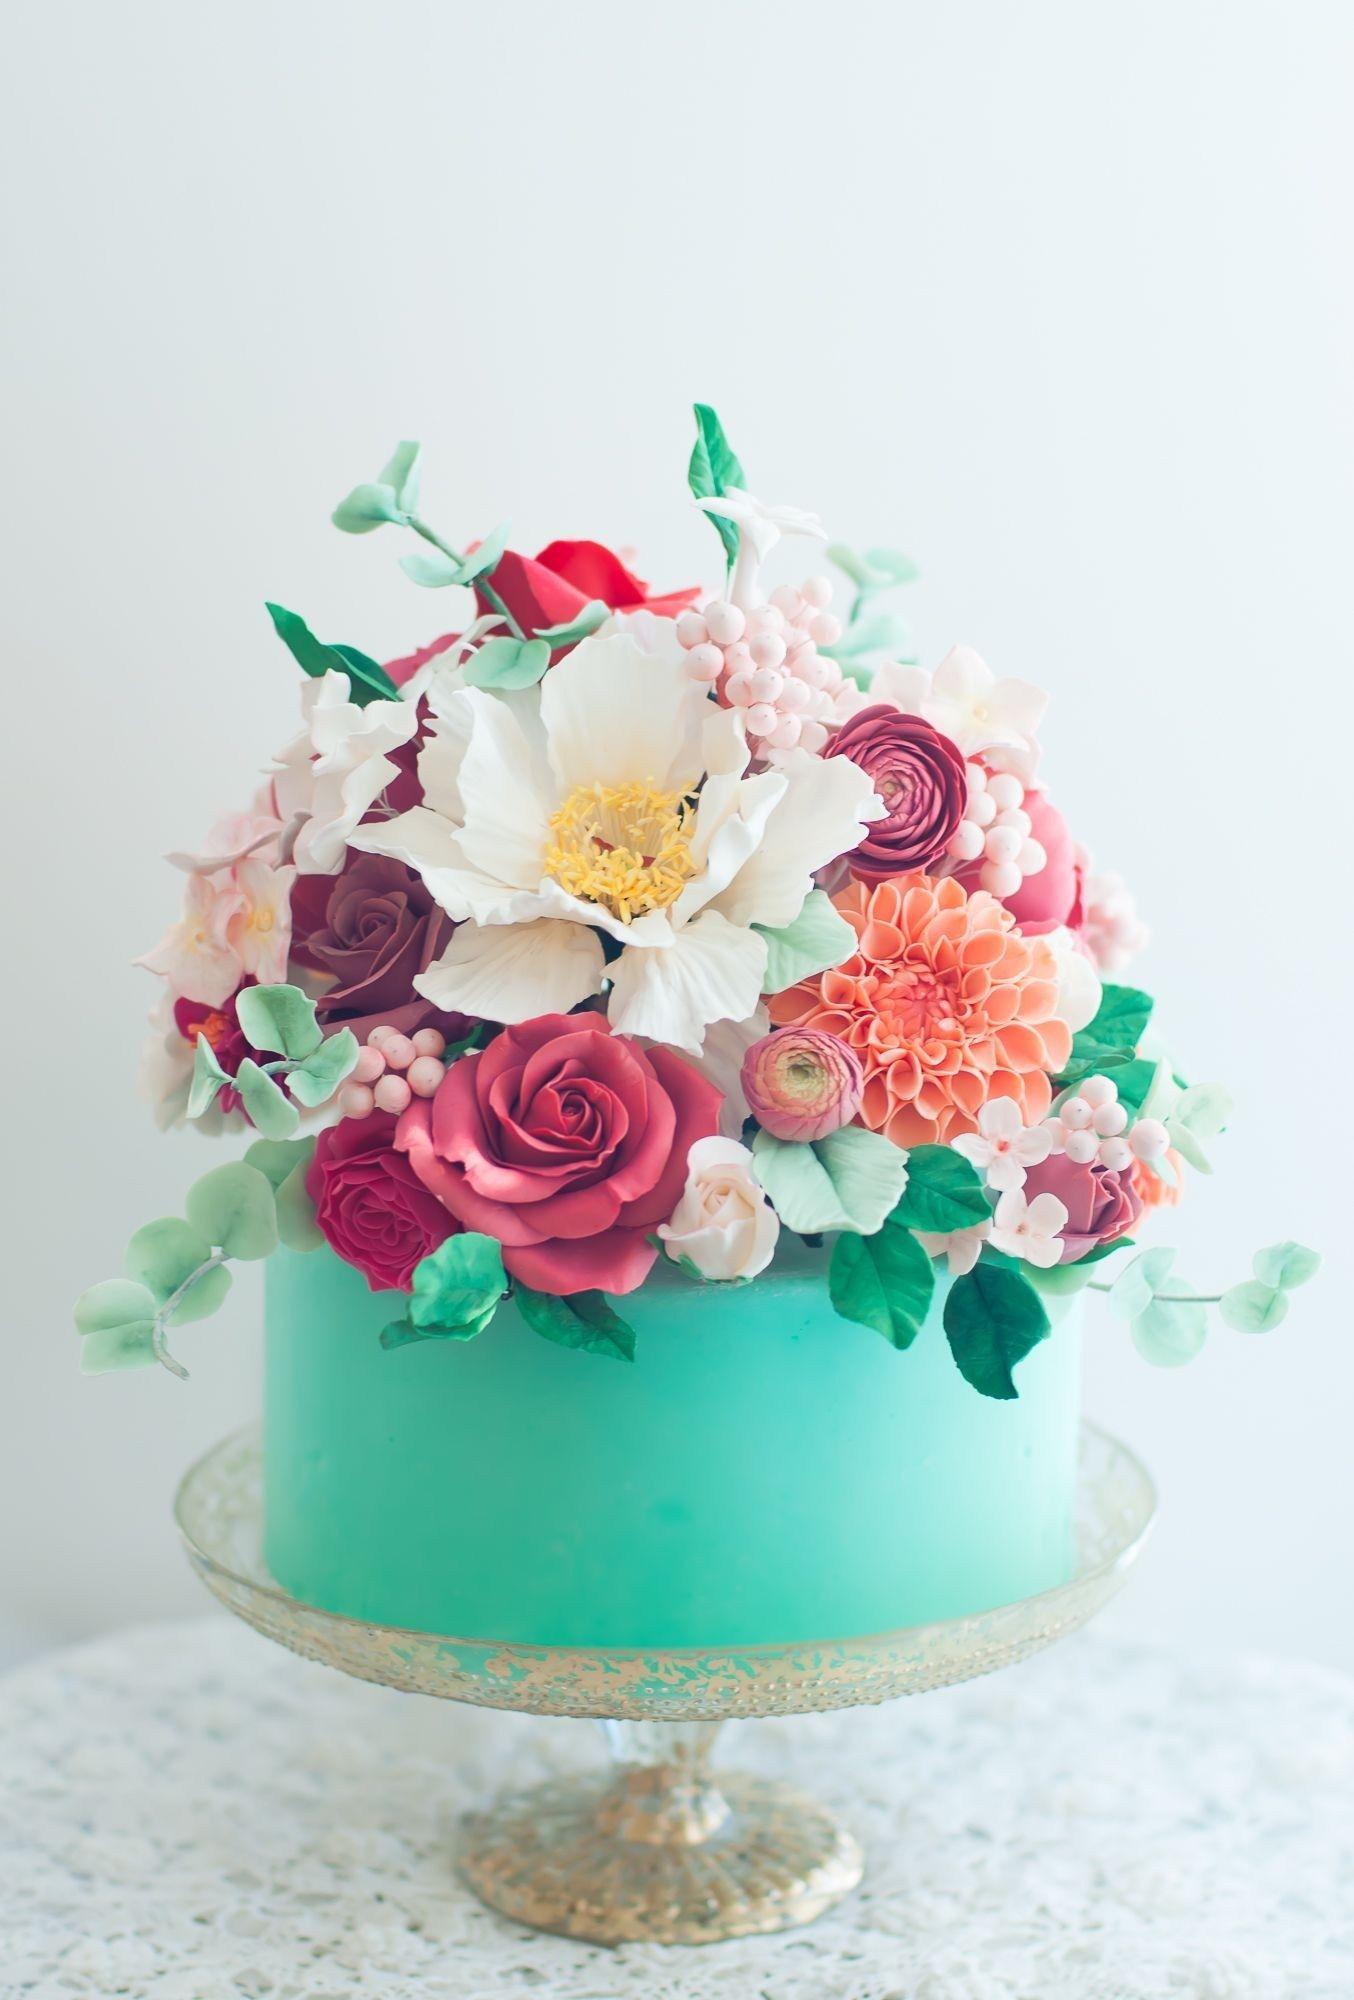 Tremendous Birthday Cakes With Flowers Aqua Floral Cake Lulus Sweet Secrets Funny Birthday Cards Online Alyptdamsfinfo